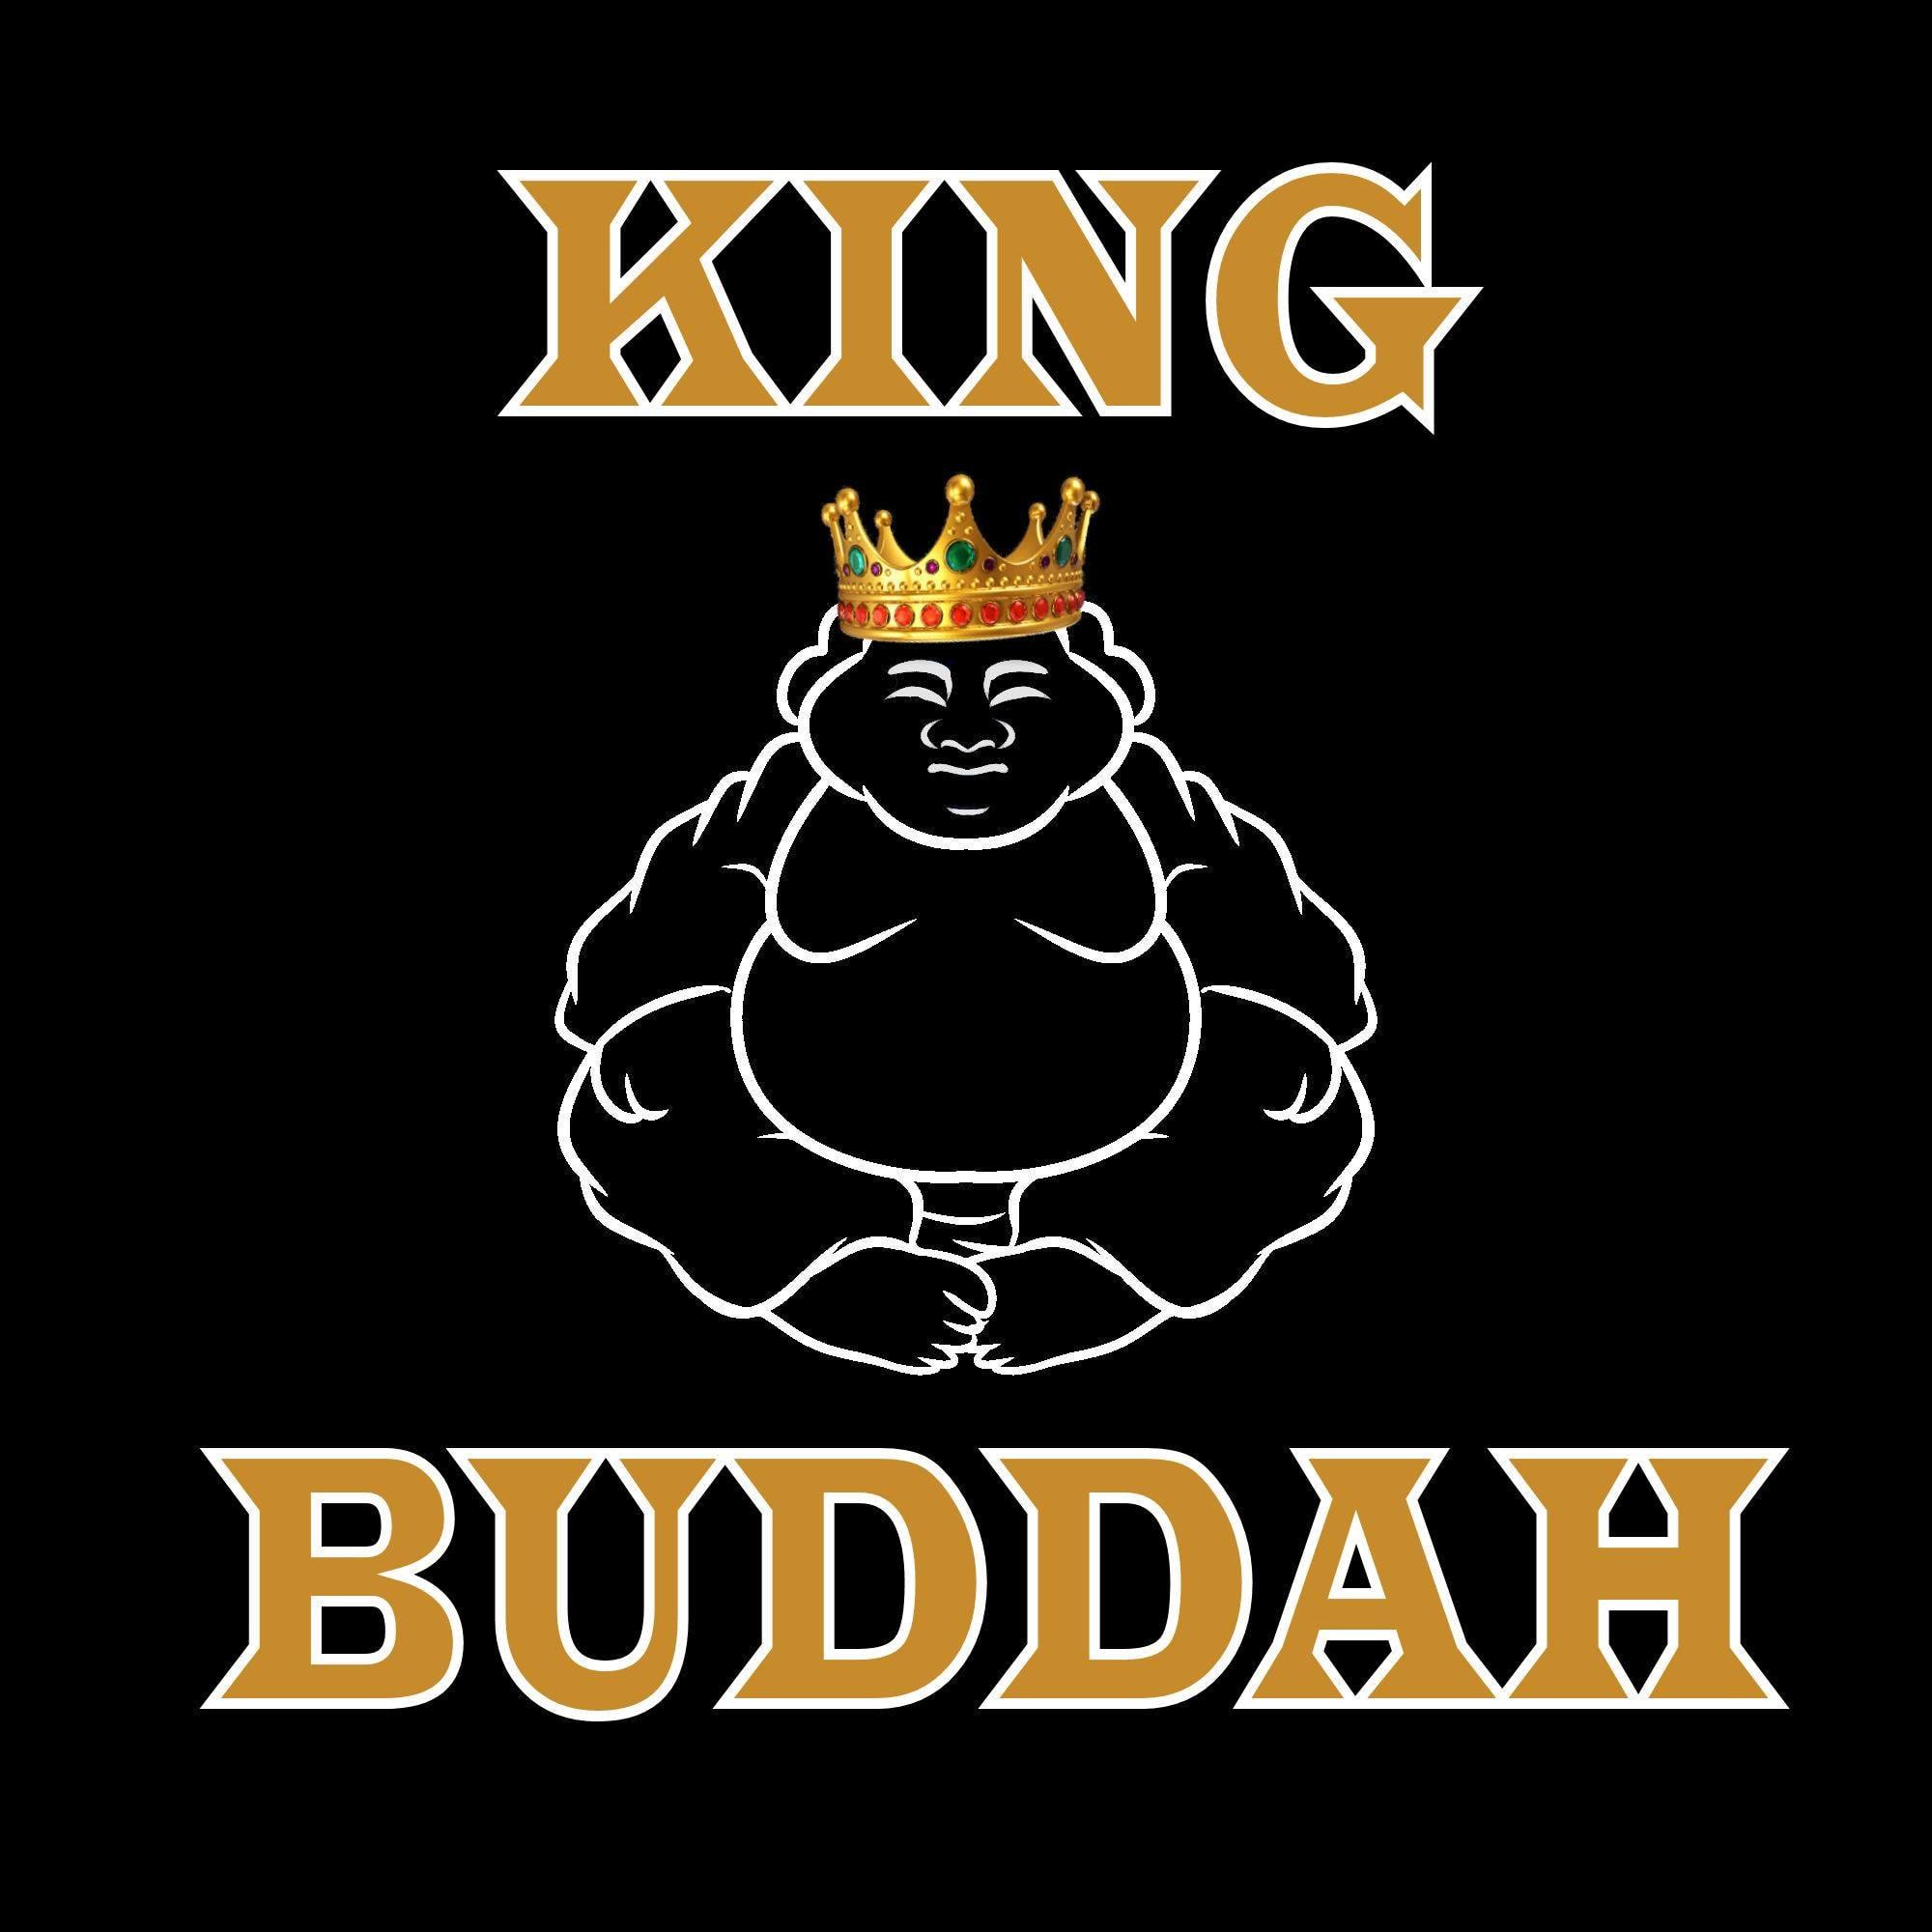 King-Buddah